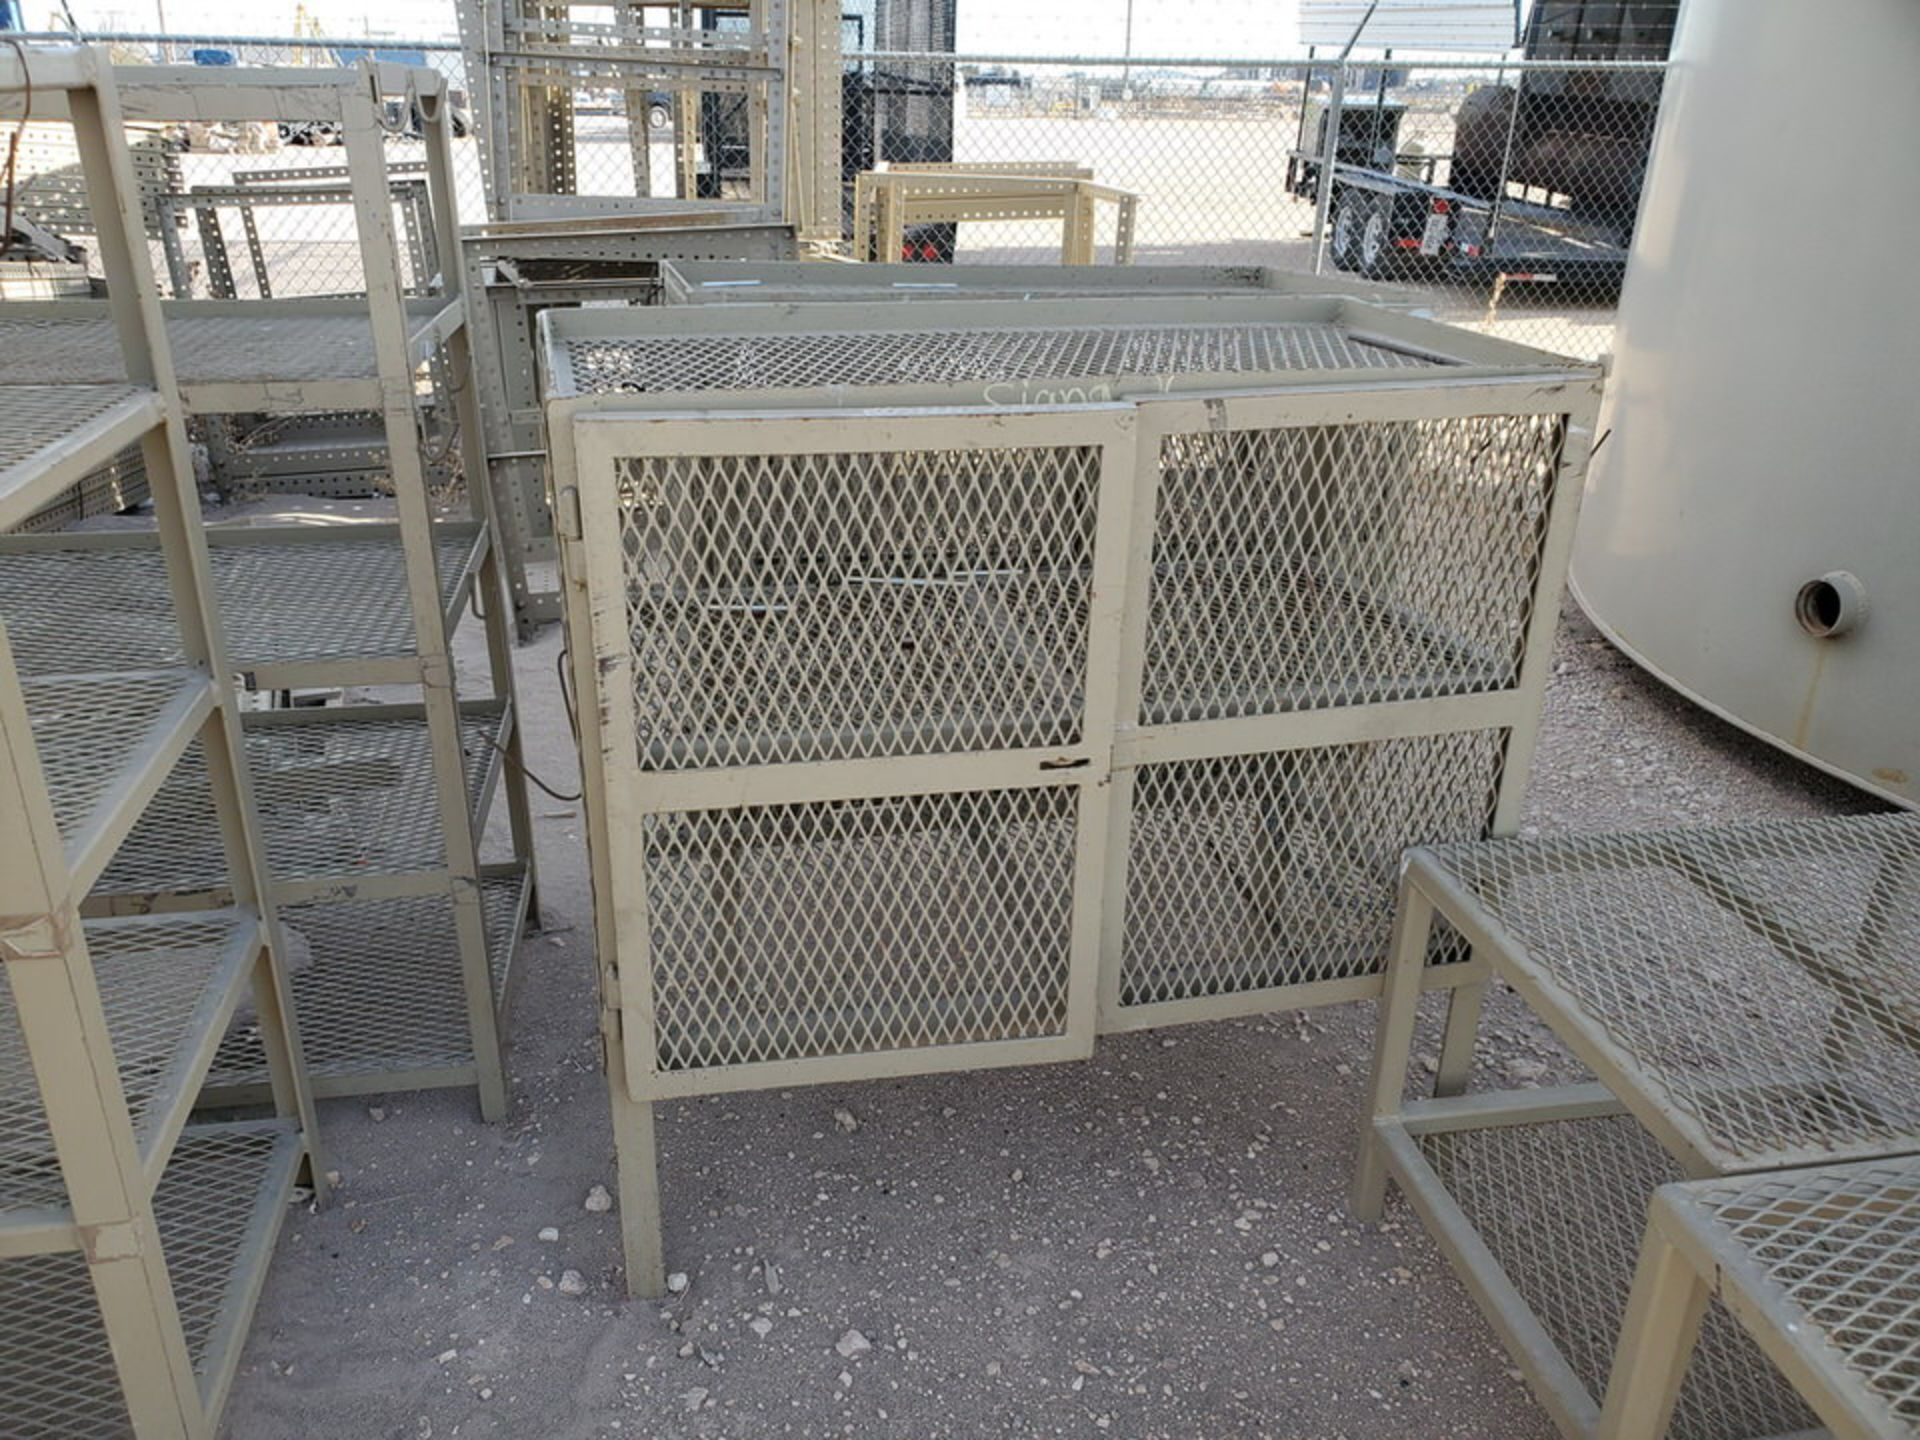 "Assorted Stl Matl. Racks & Ladders Size Range: 30"" x 26"" x 25""H - 29"" x 48"" x 50""H - Image 8 of 18"